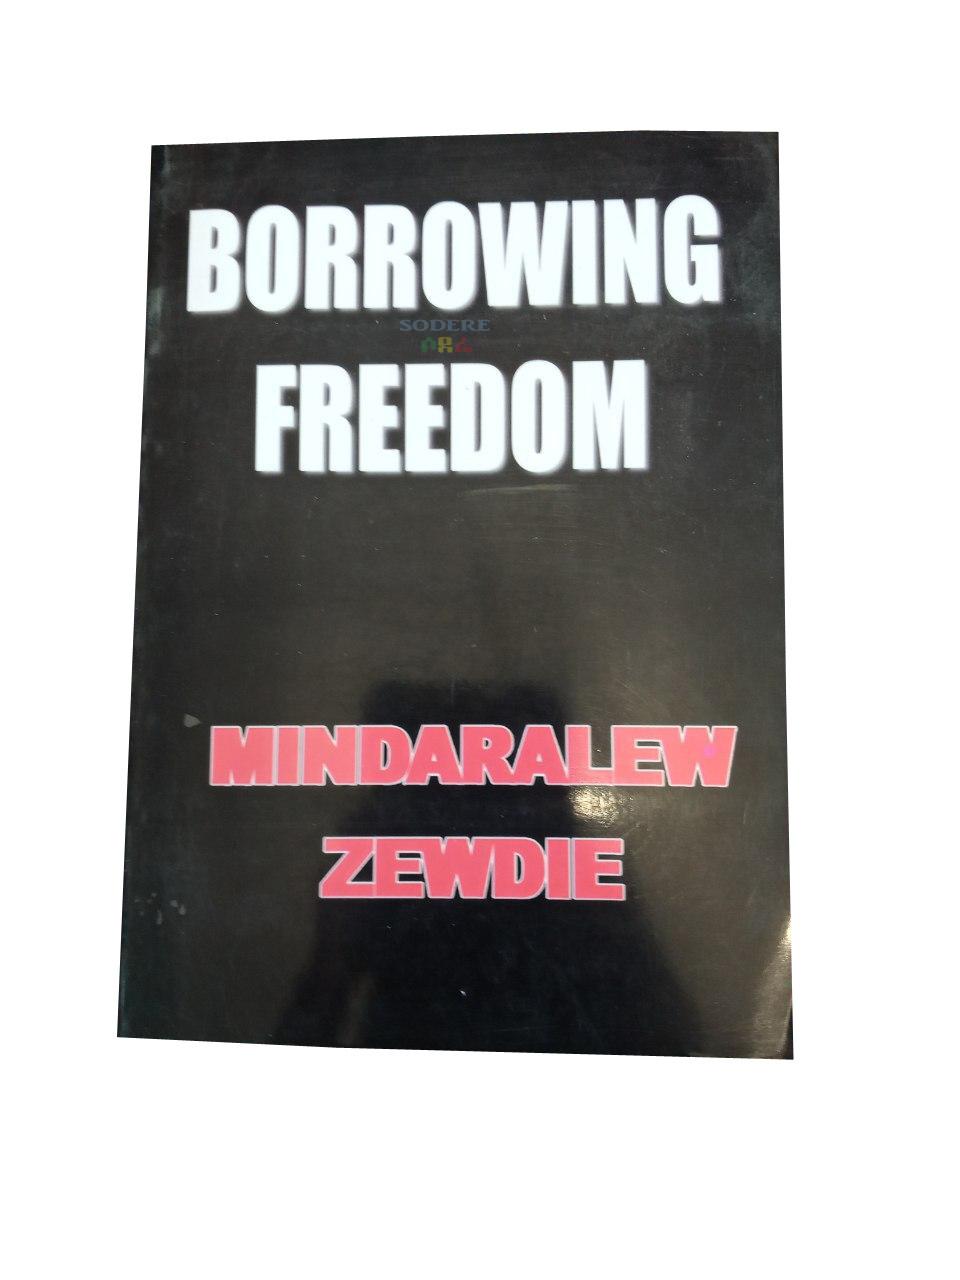 Borrowing Freedom By Mindaralew Zewdie